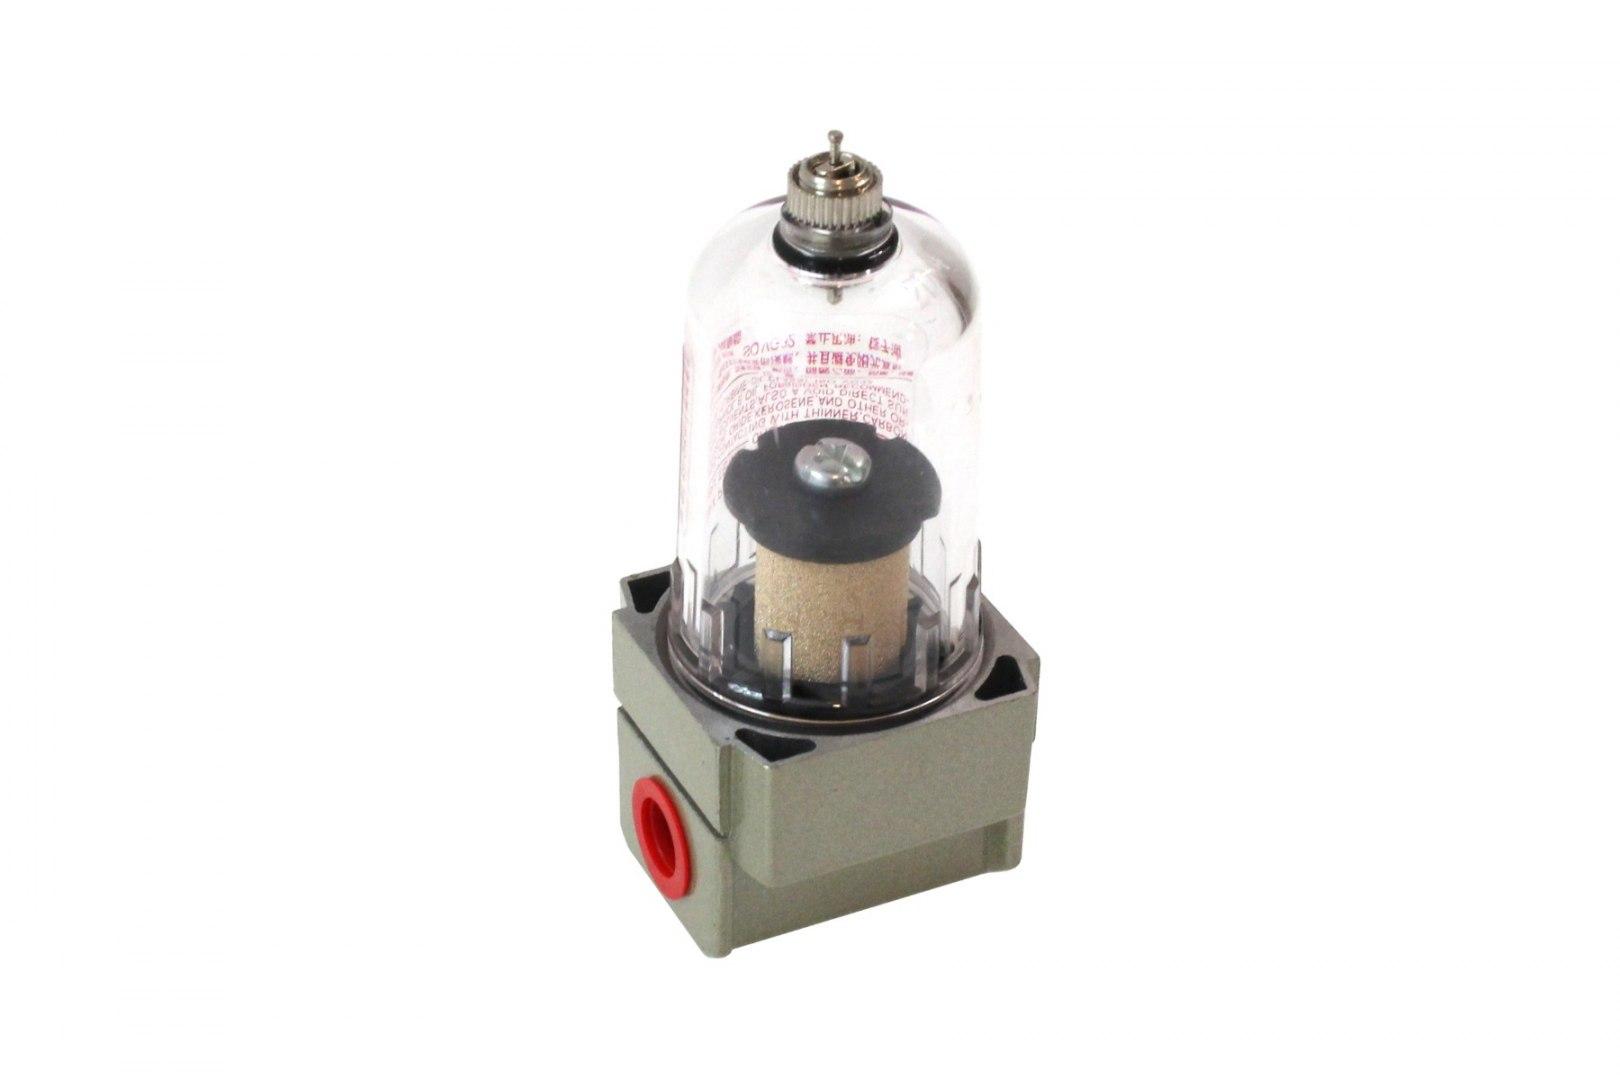 Oil catch tank 0.1L 6mm / 8mm / 10mm / 12mm Epman - GRUBYGARAGE - Sklep Tuningowy